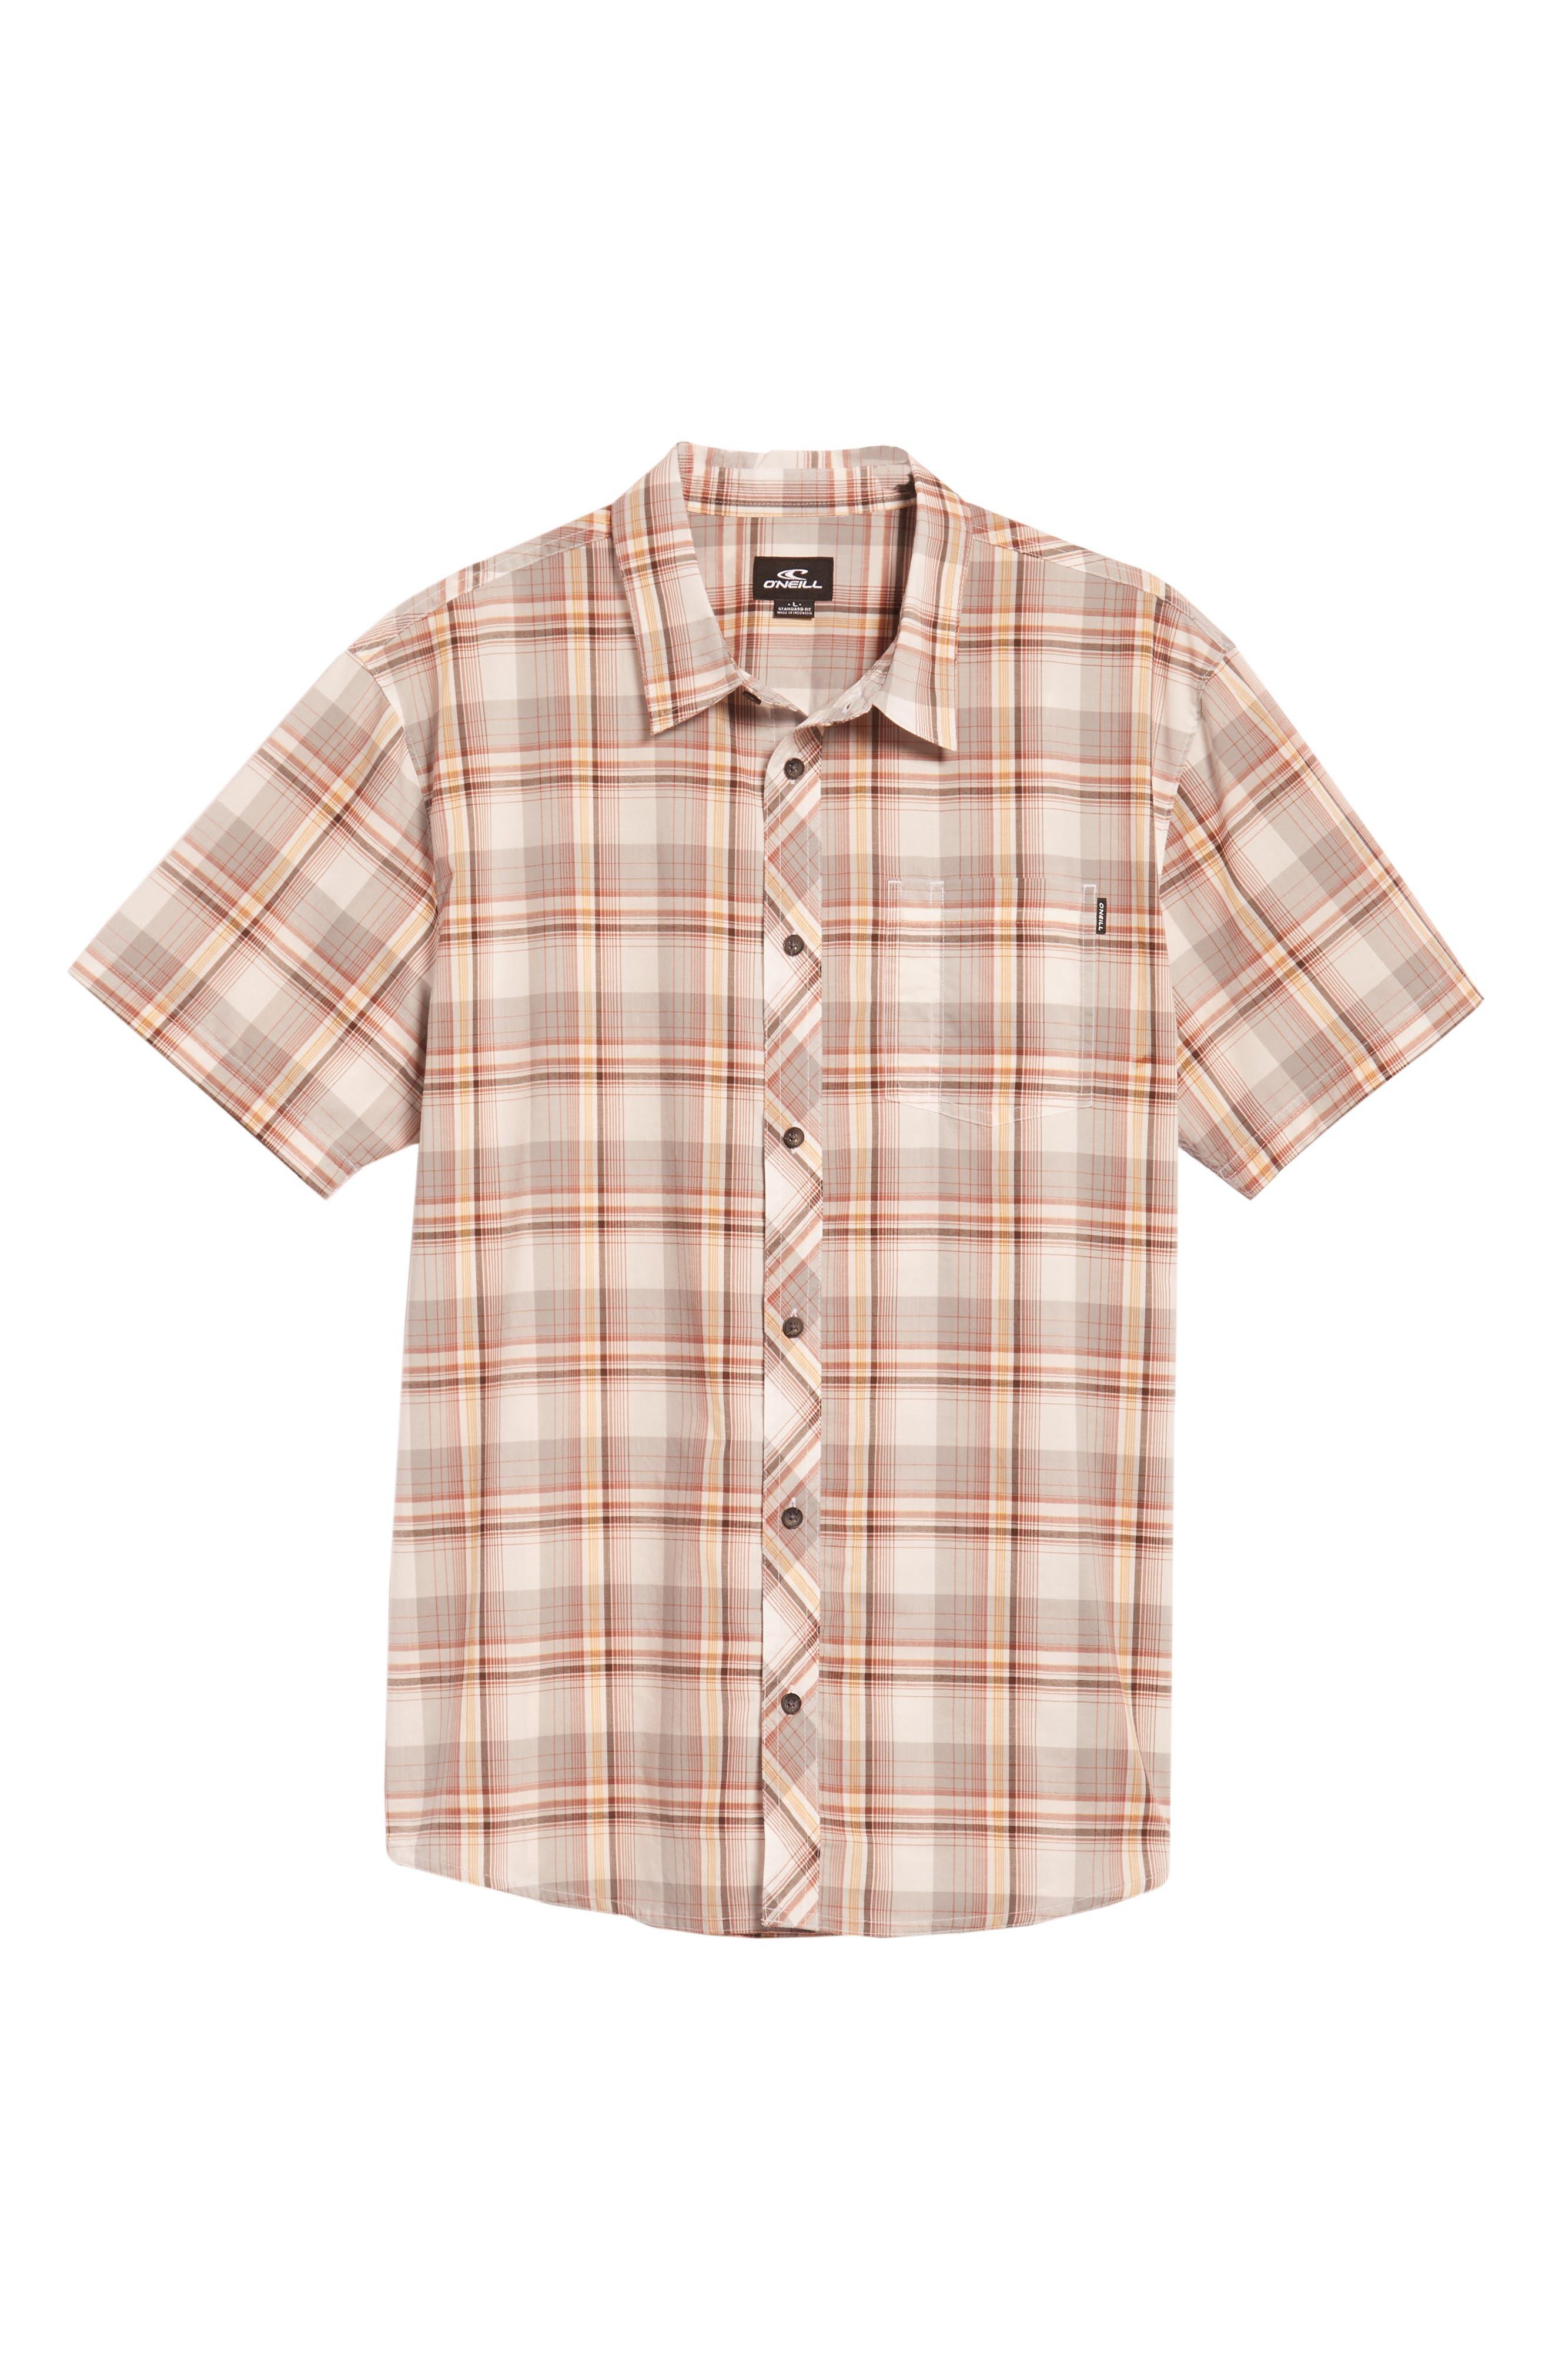 Gentry Short Sleeve Shirt,                             Alternate thumbnail 17, color,